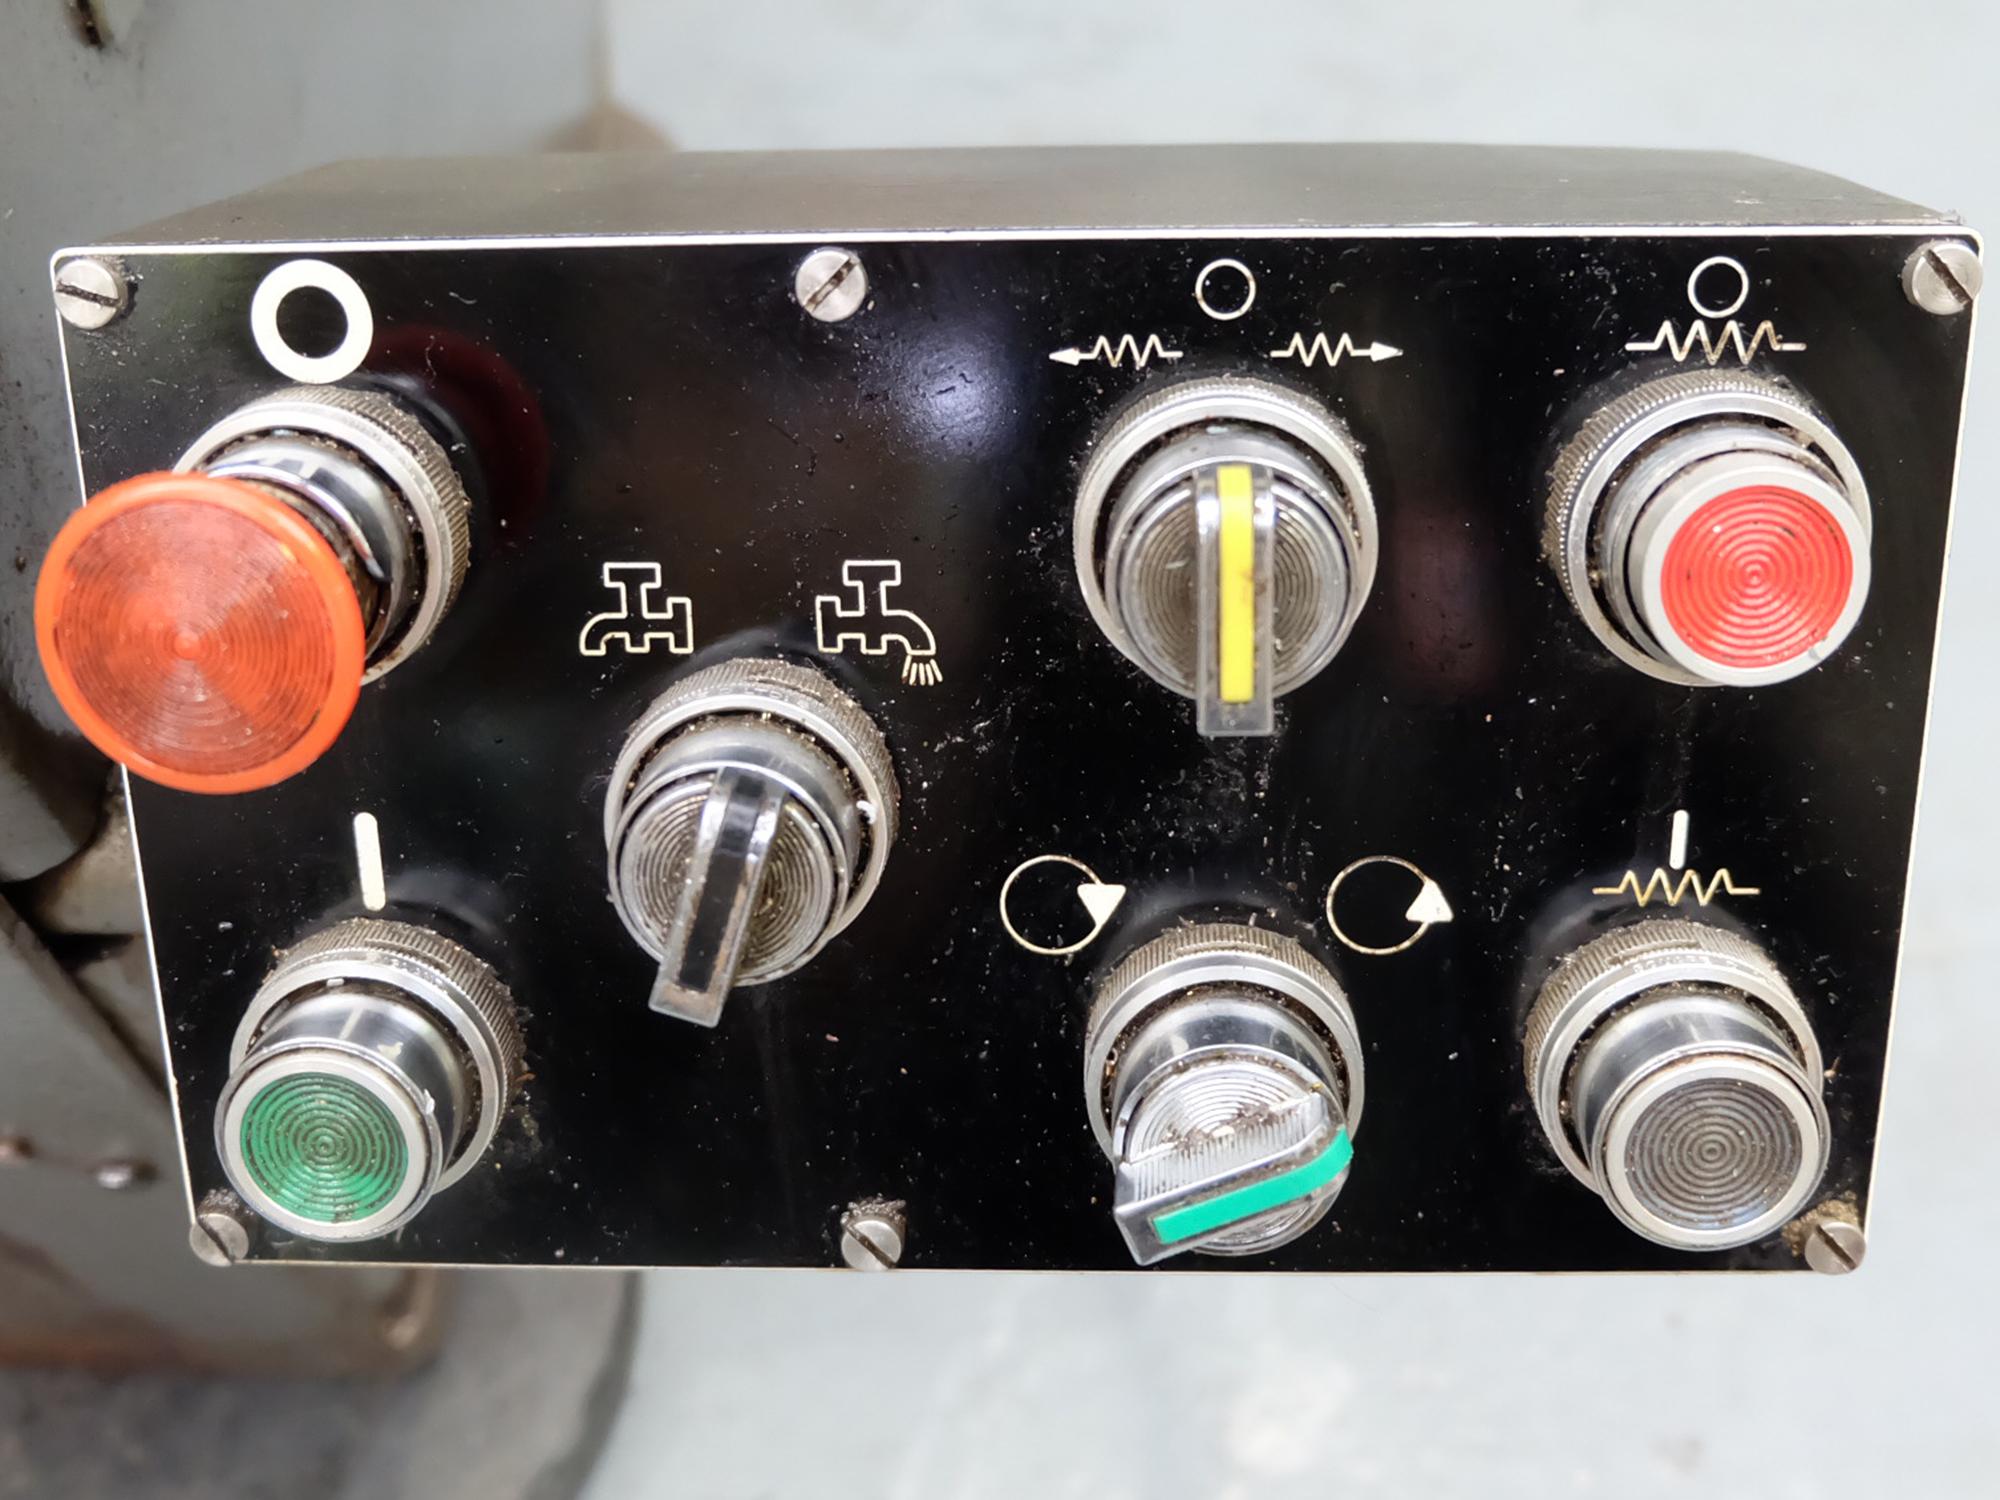 Veceroy AEW: Horizontal Milling Machine. - Image 6 of 10